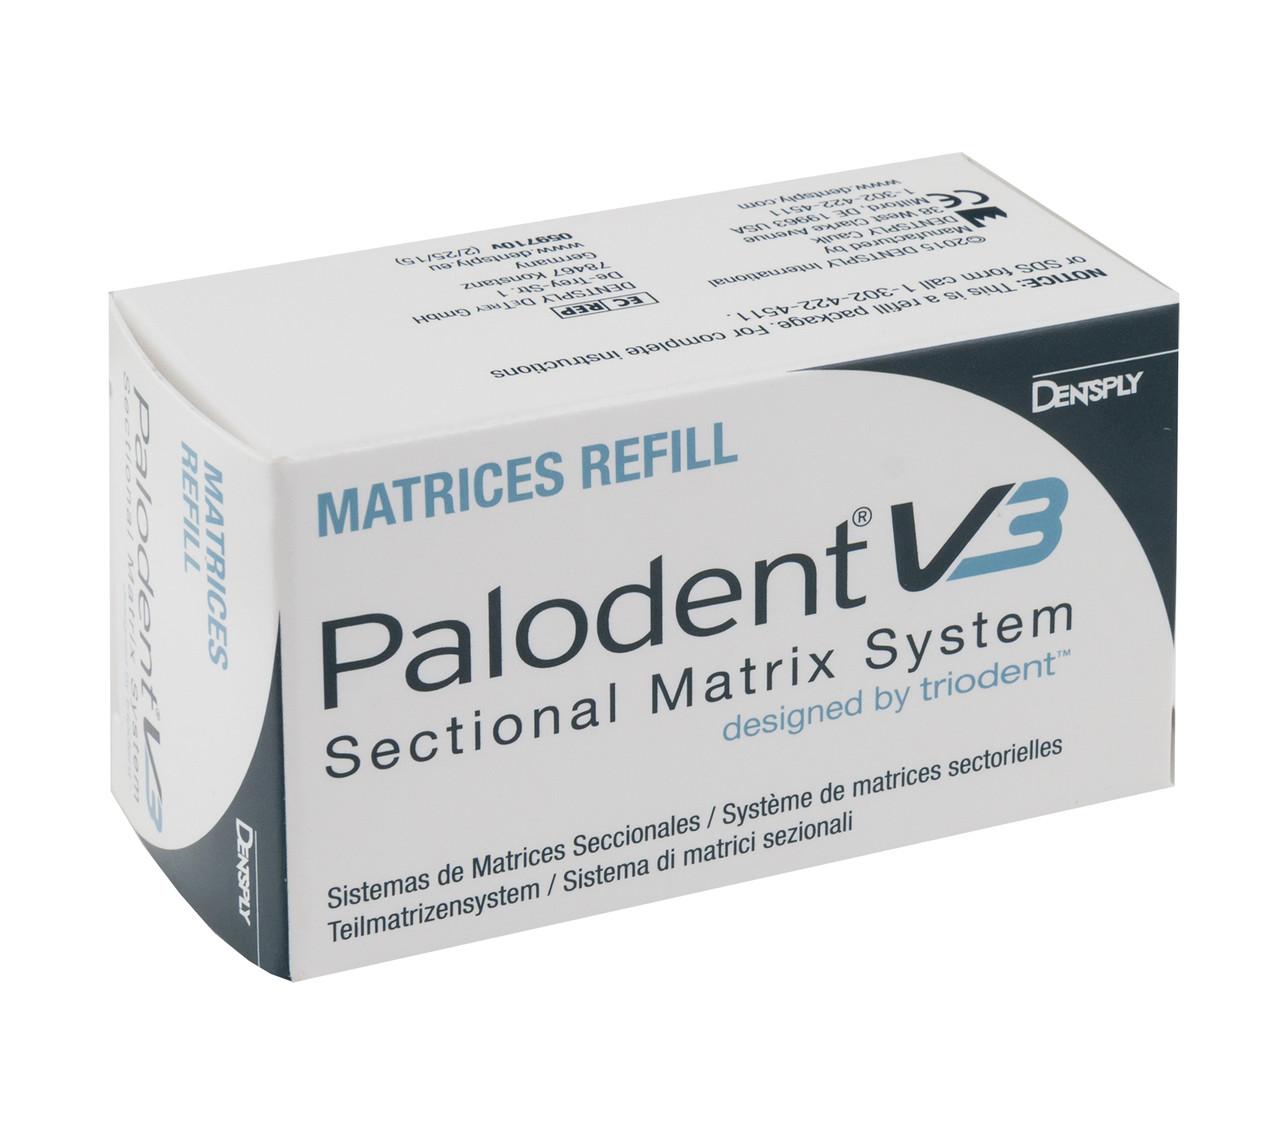 Матрицы ПалодентV3 (Palodent® V3,Dentsply Sirona, 5,5 мм.), 50шт./уп.